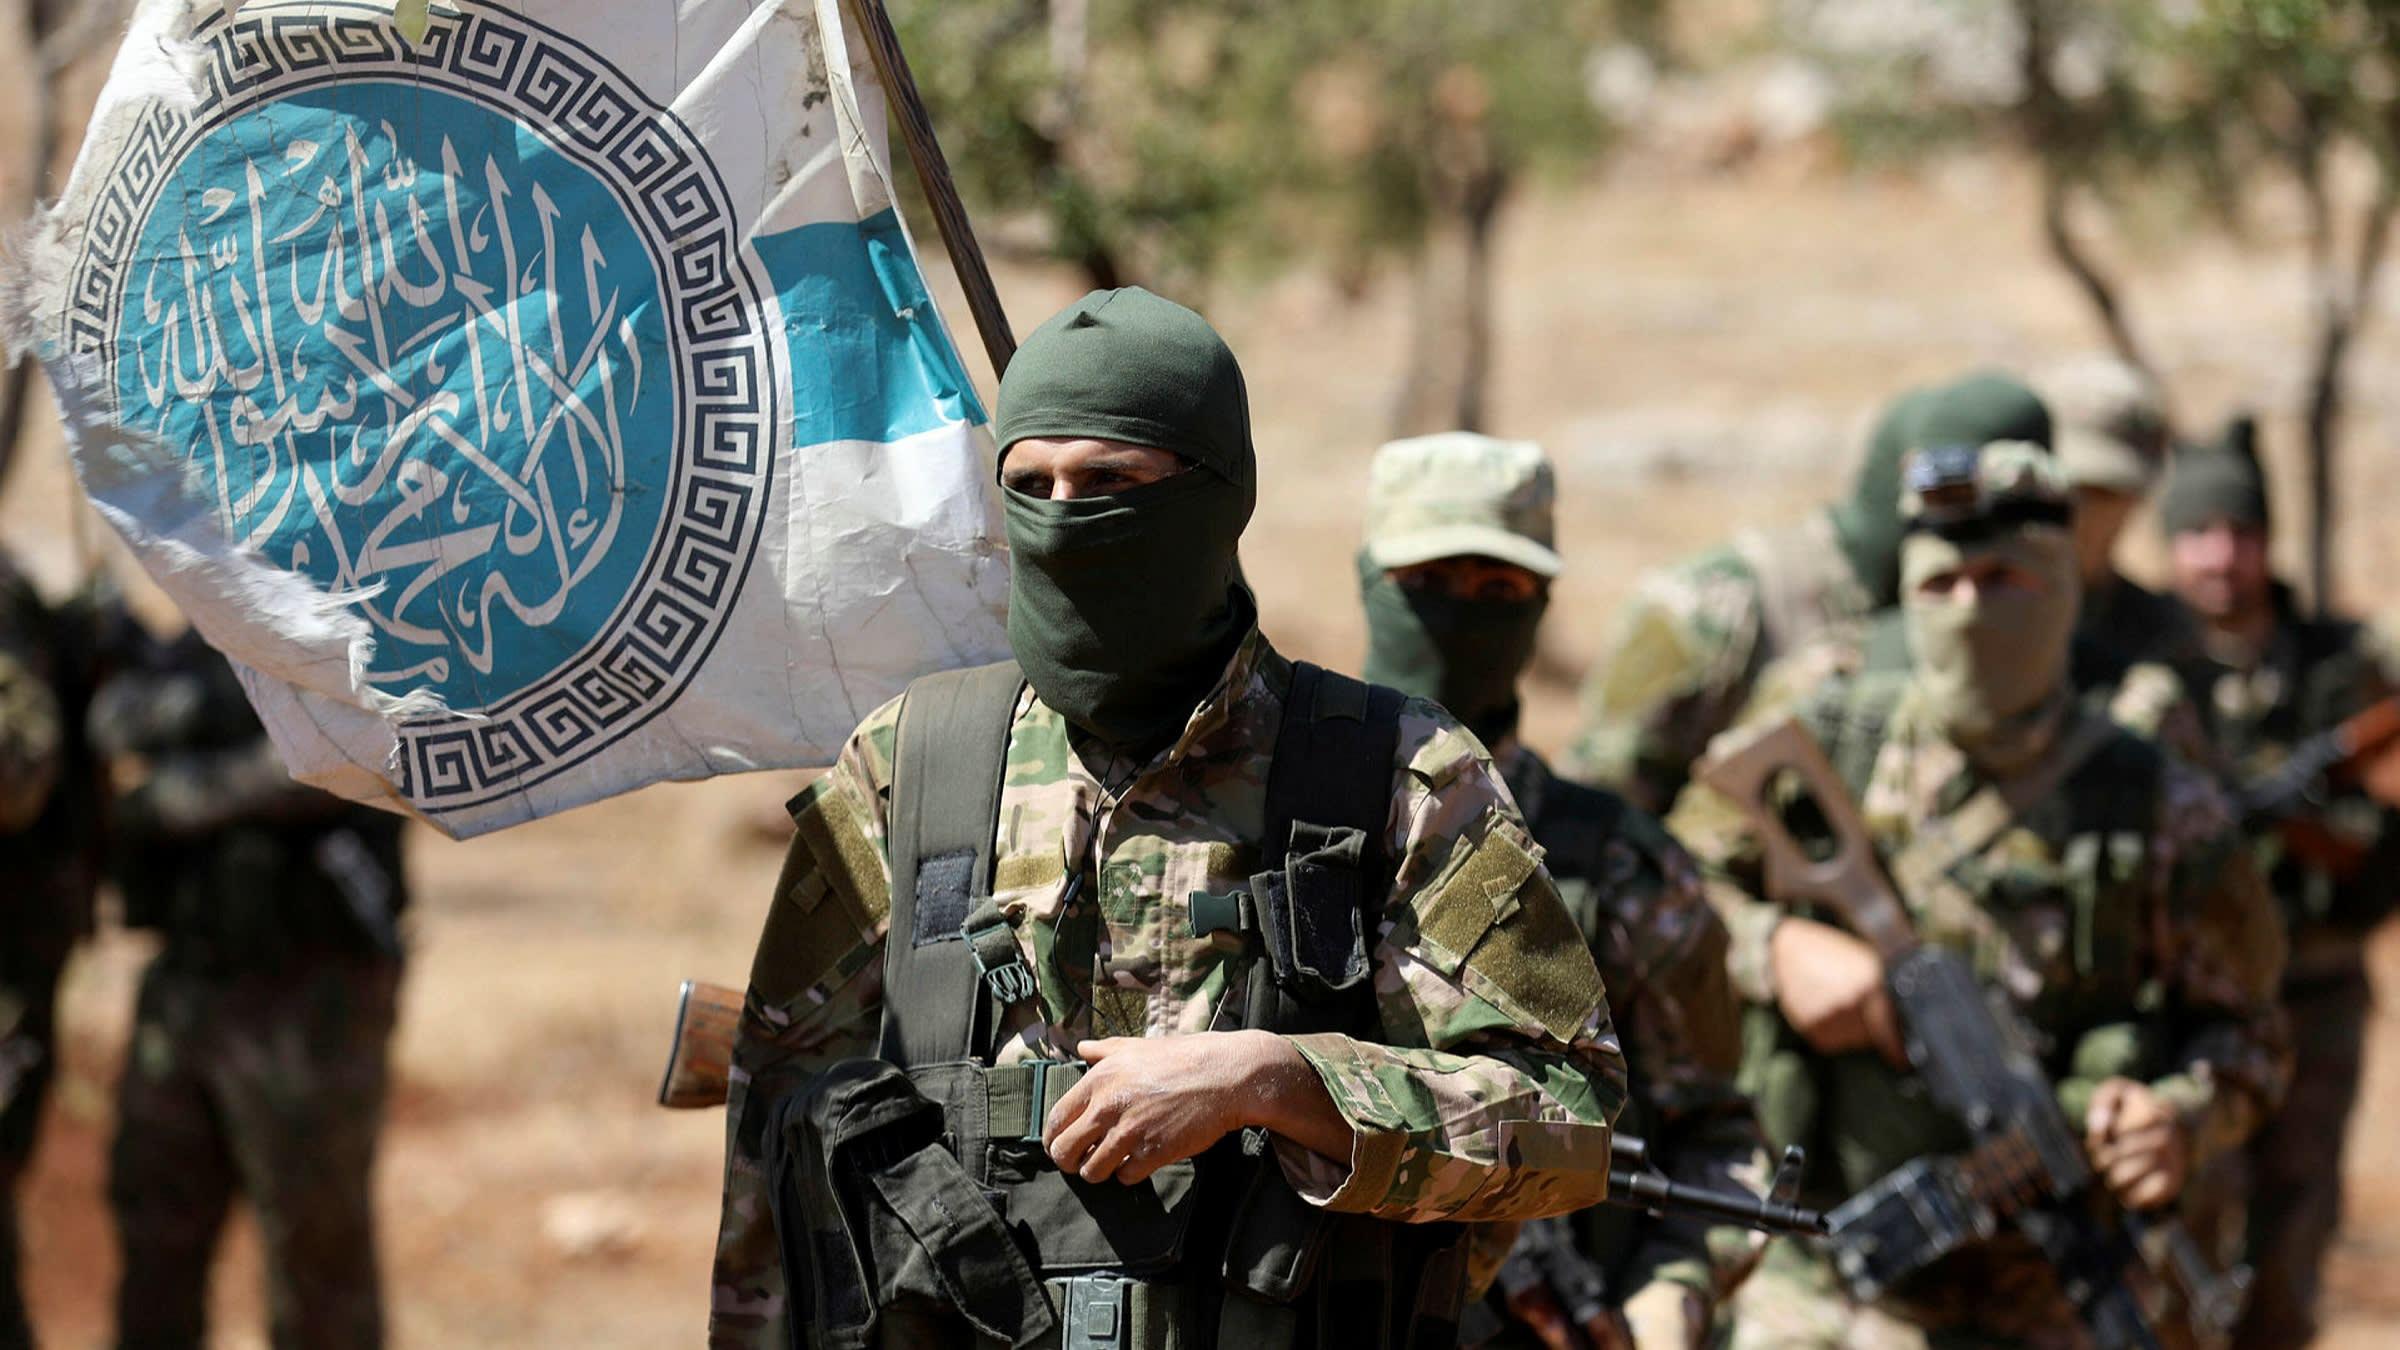 Family Feud: HTS Slams Turkey For Calling It 'Terrorist Group'